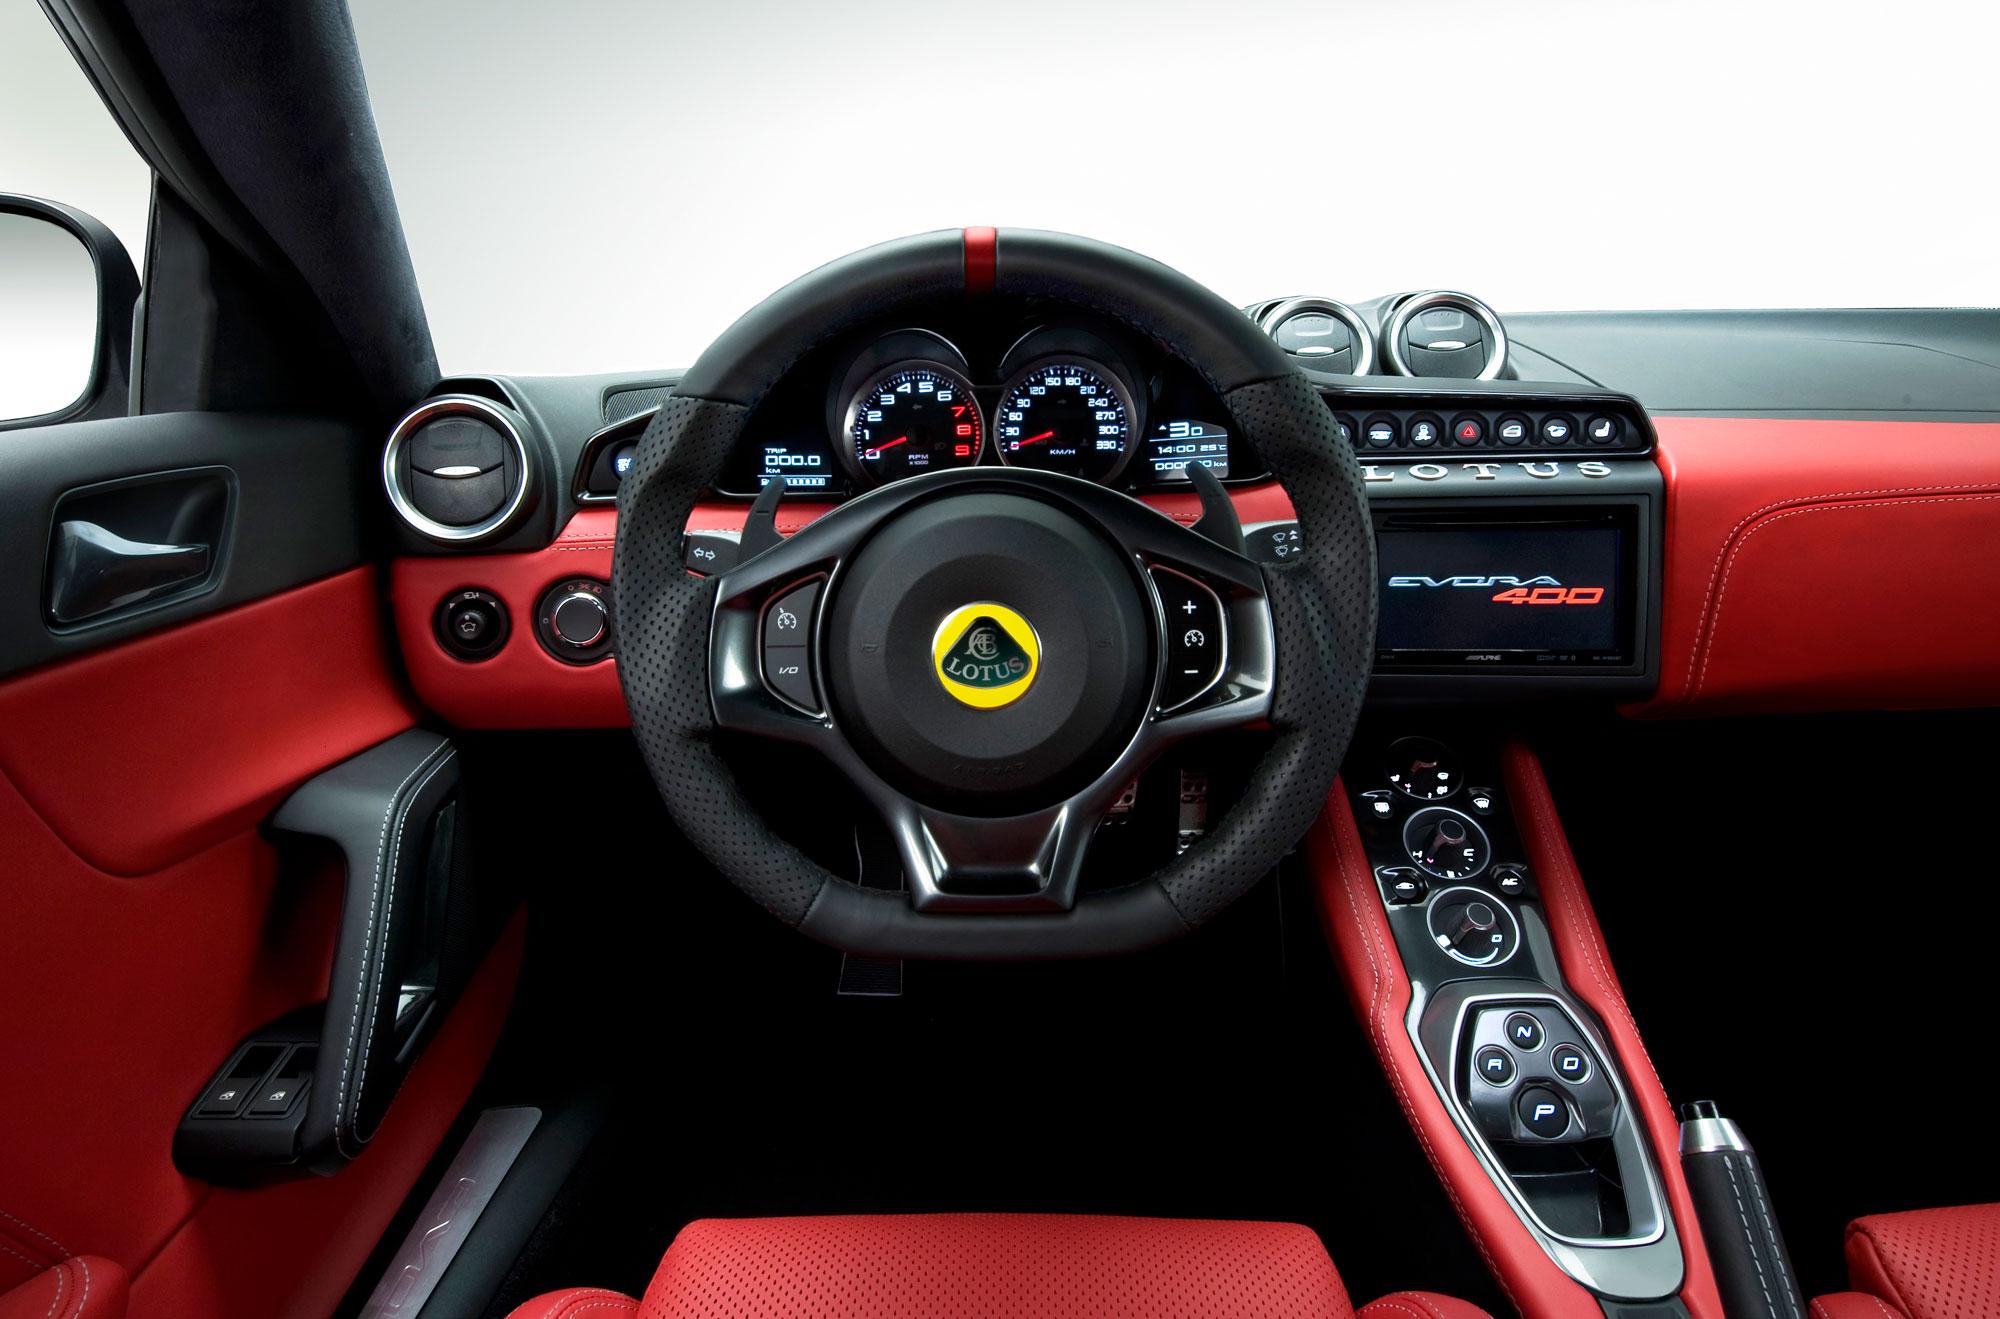 Lotus evora 400 vs cayman gts lotus evora 400 vs cayman gts evora 400 interior straight vanachro Image collections